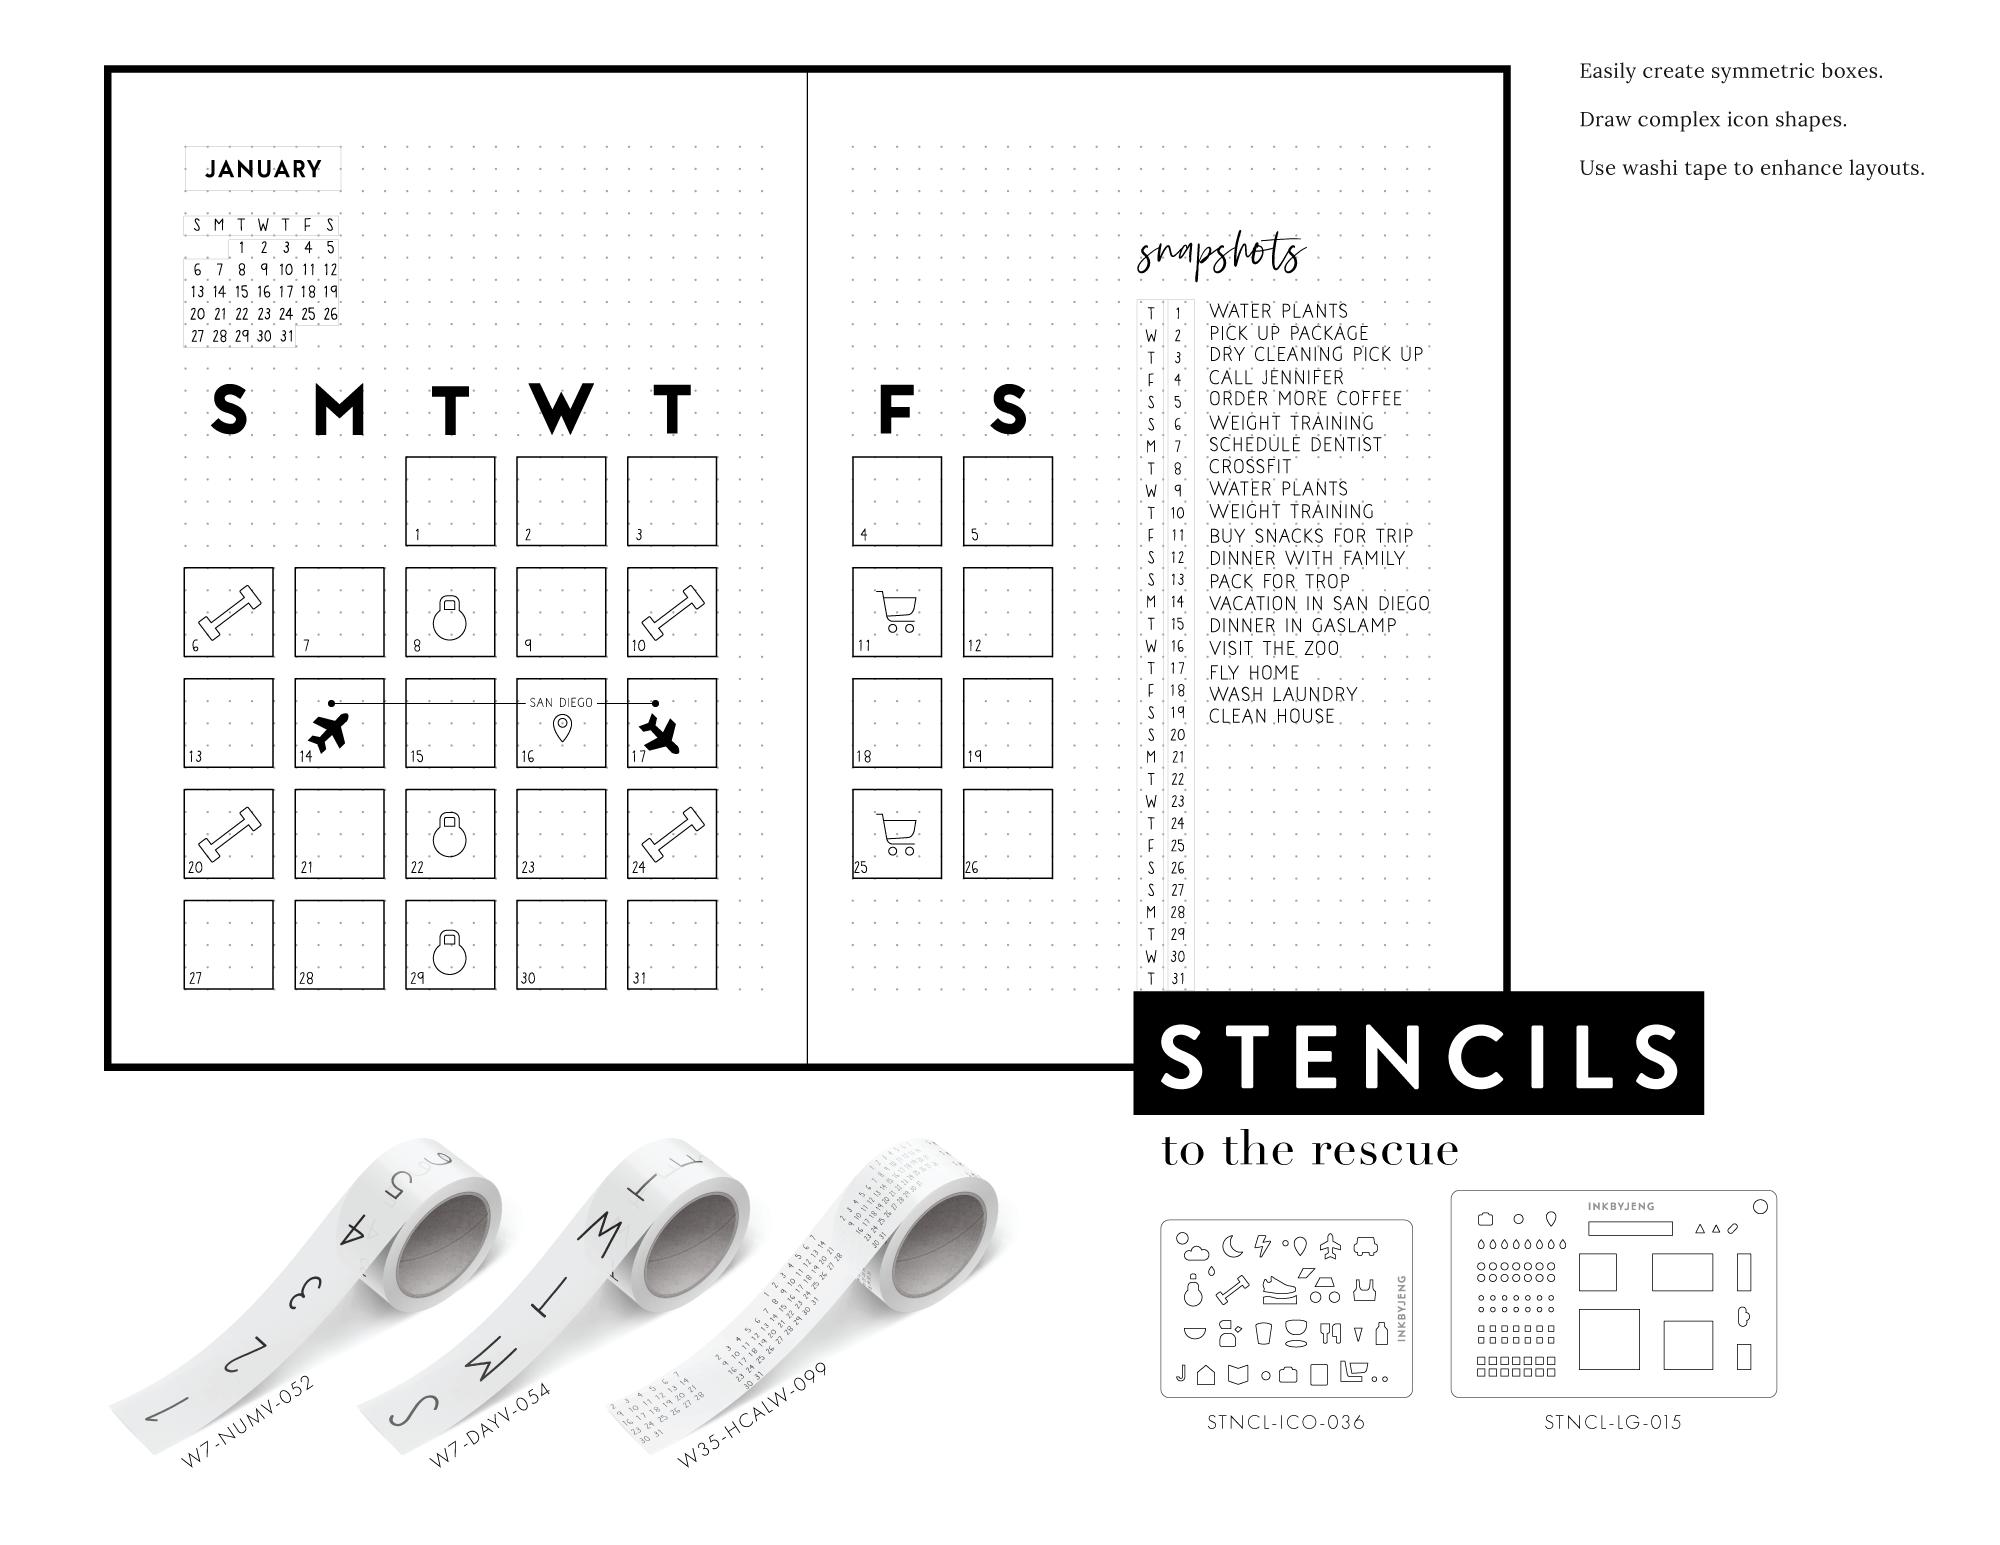 spread_samples-v-02.png